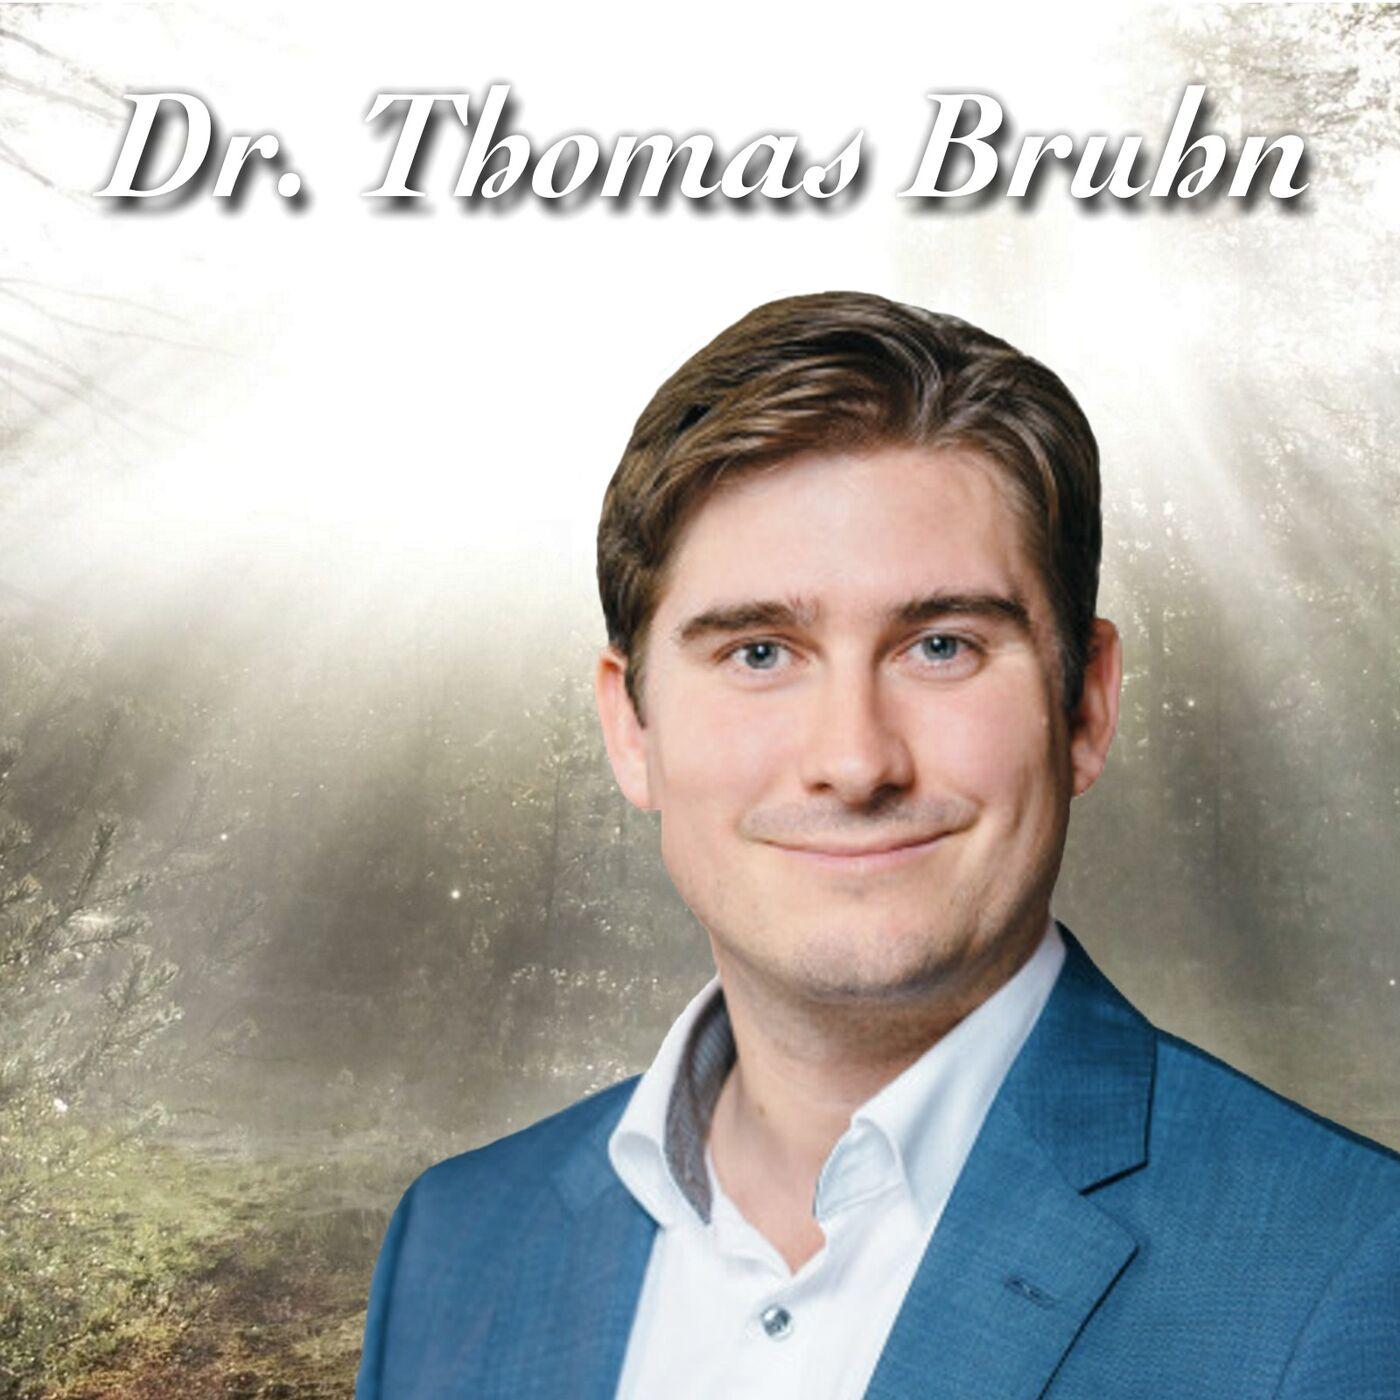 Eile mit Weile - Dr. Thomas Bruhn